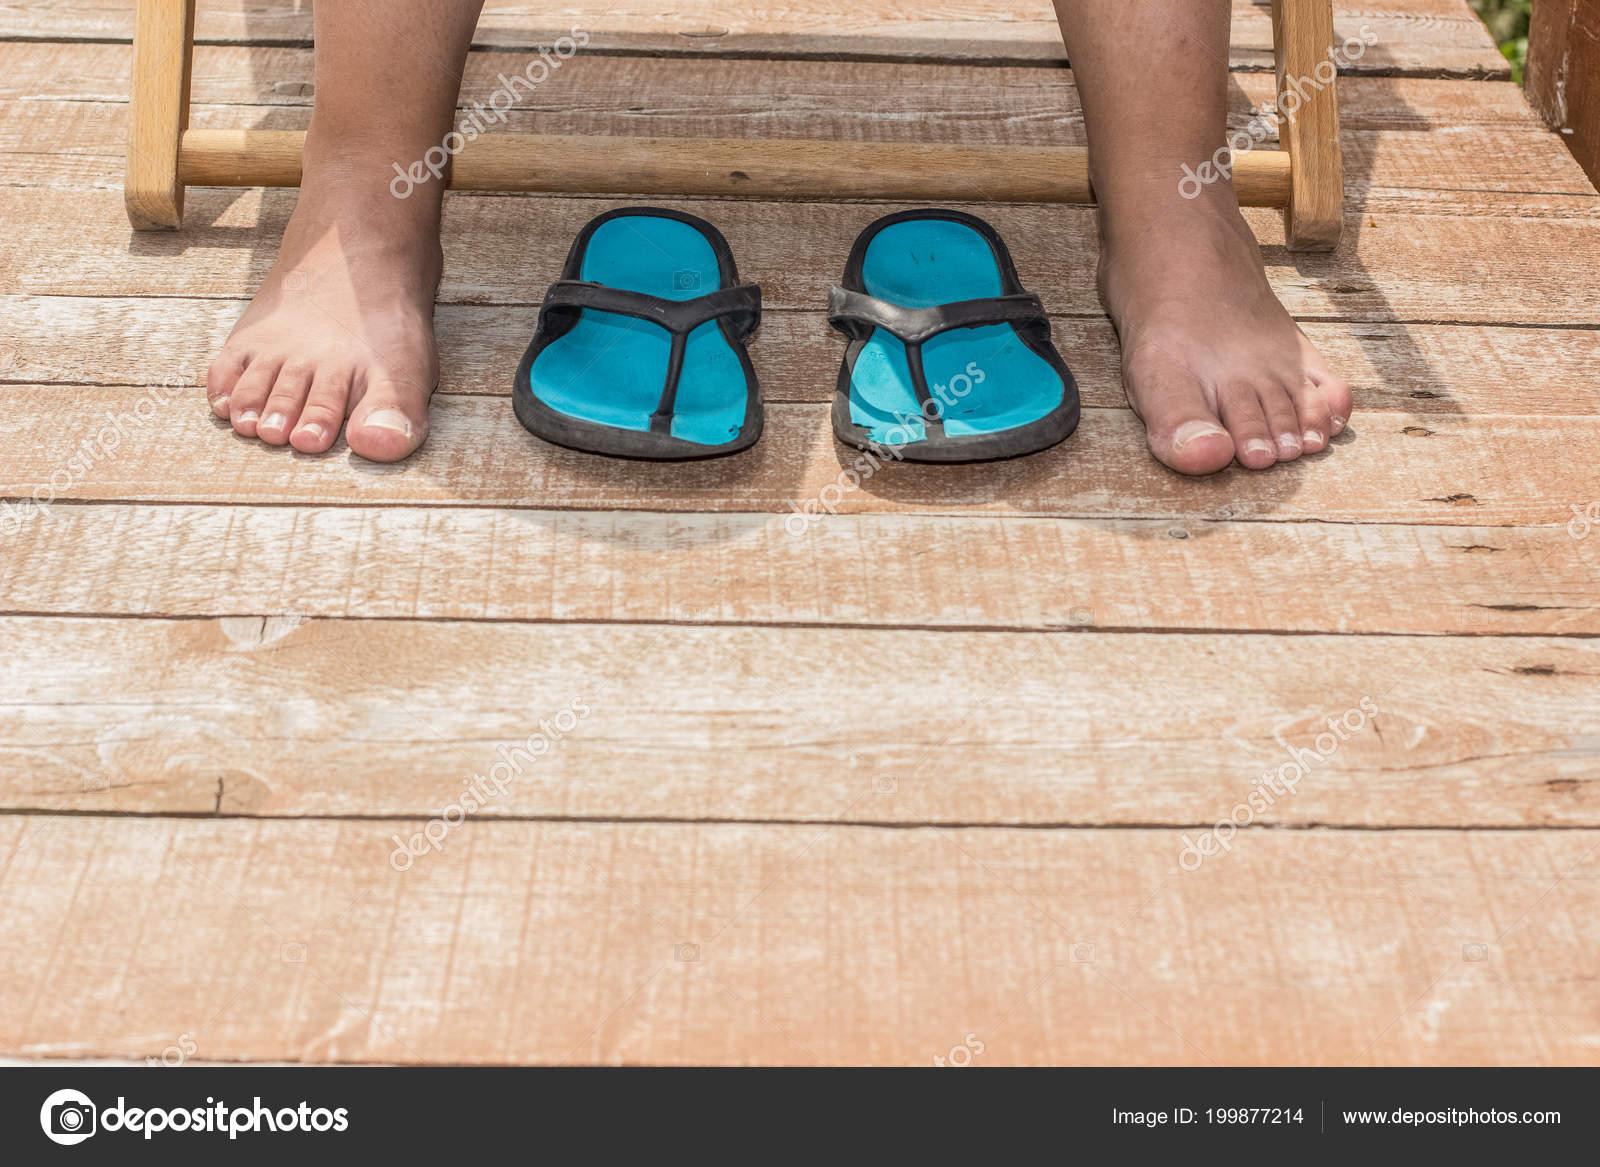 cc6392474d22 Girl Bare Feet Flip Flop Wooden Floor Rest Concept Empty — Stock Photo